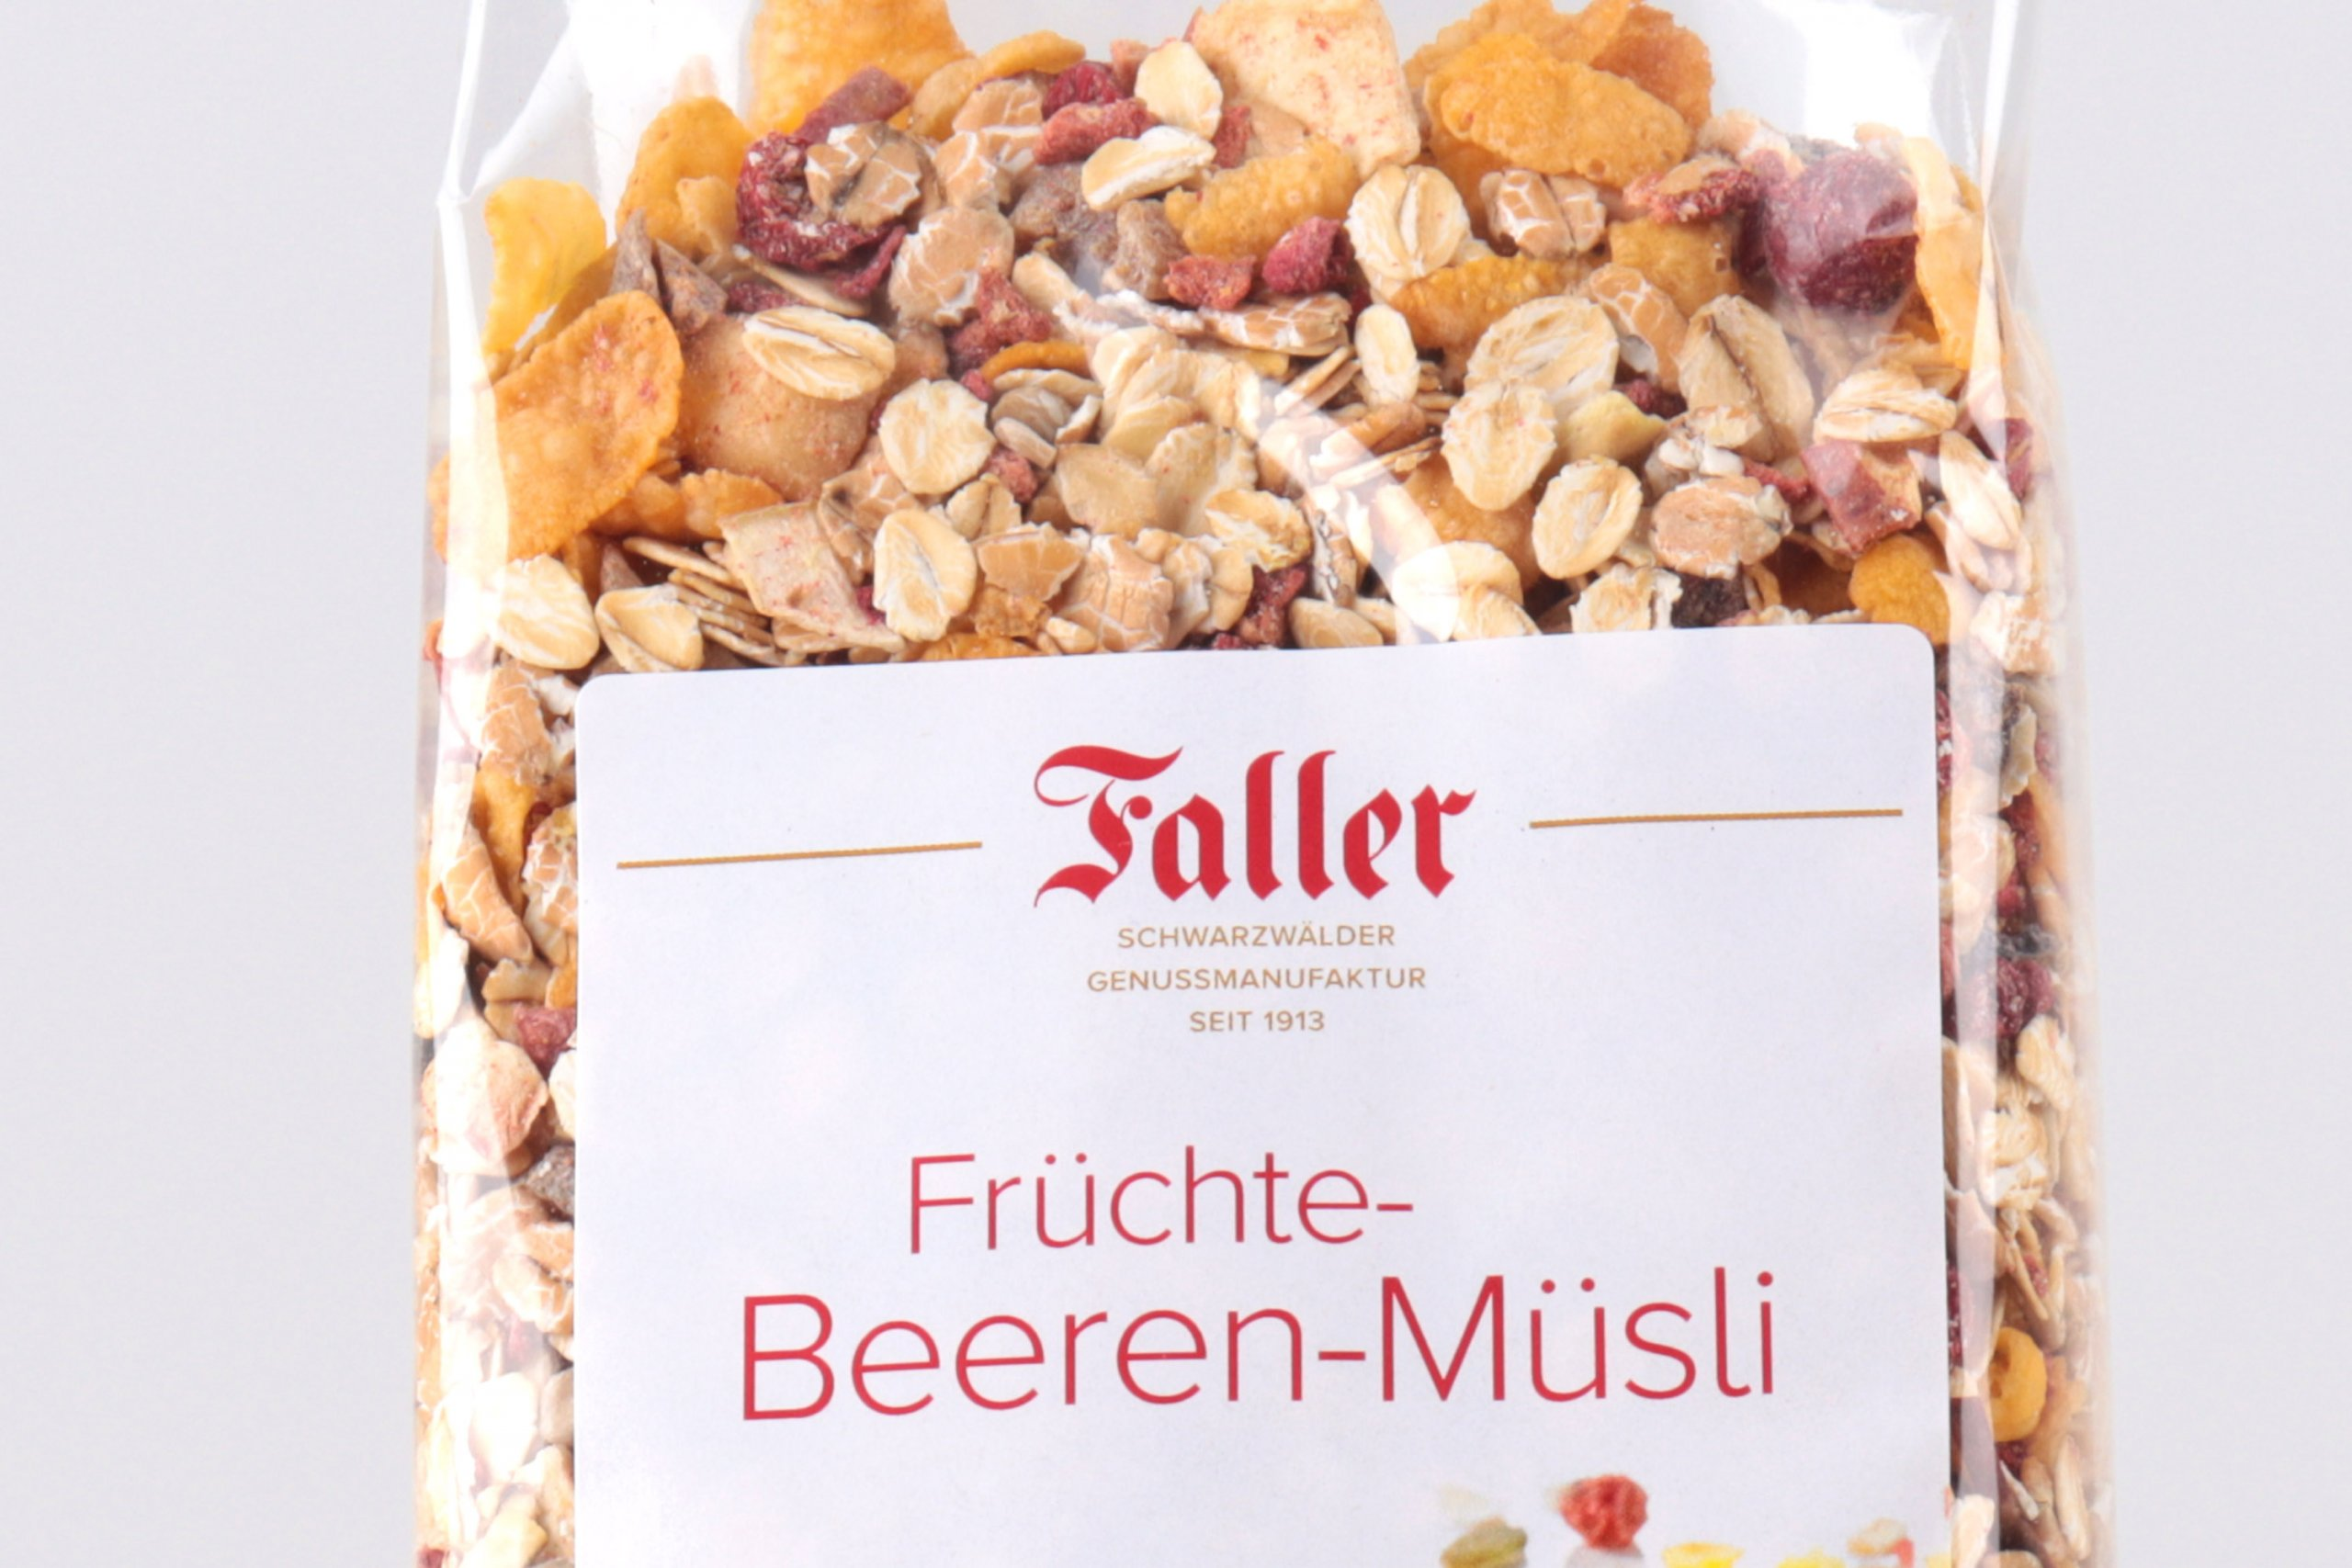 Fruechte Beeren Gourmet Müsli von feinjemacht kaufen